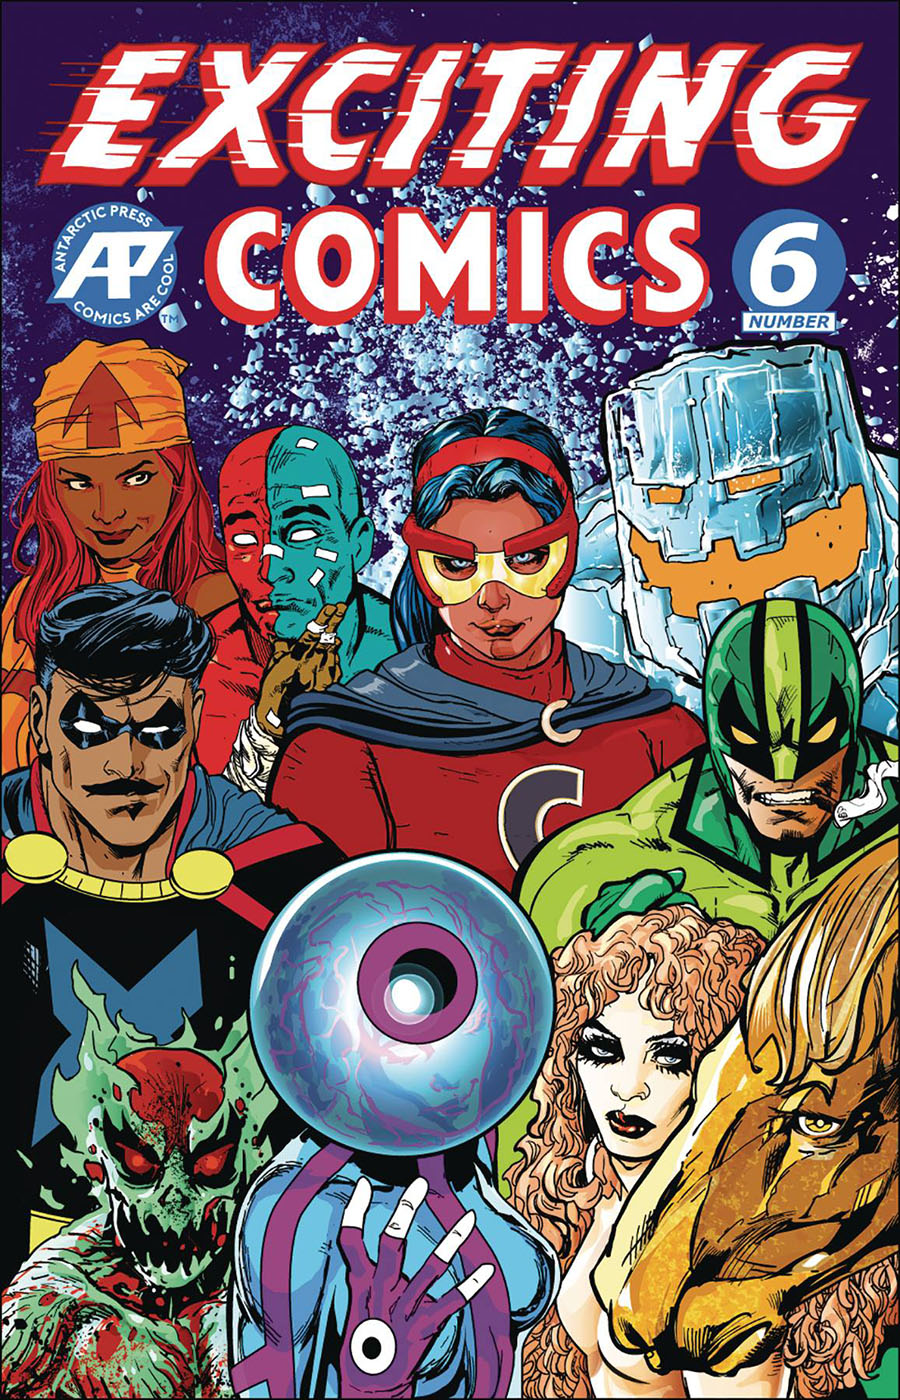 Exciting Comics Vol 2 #6 Cover B Variant Brian Denham Legacy Cover